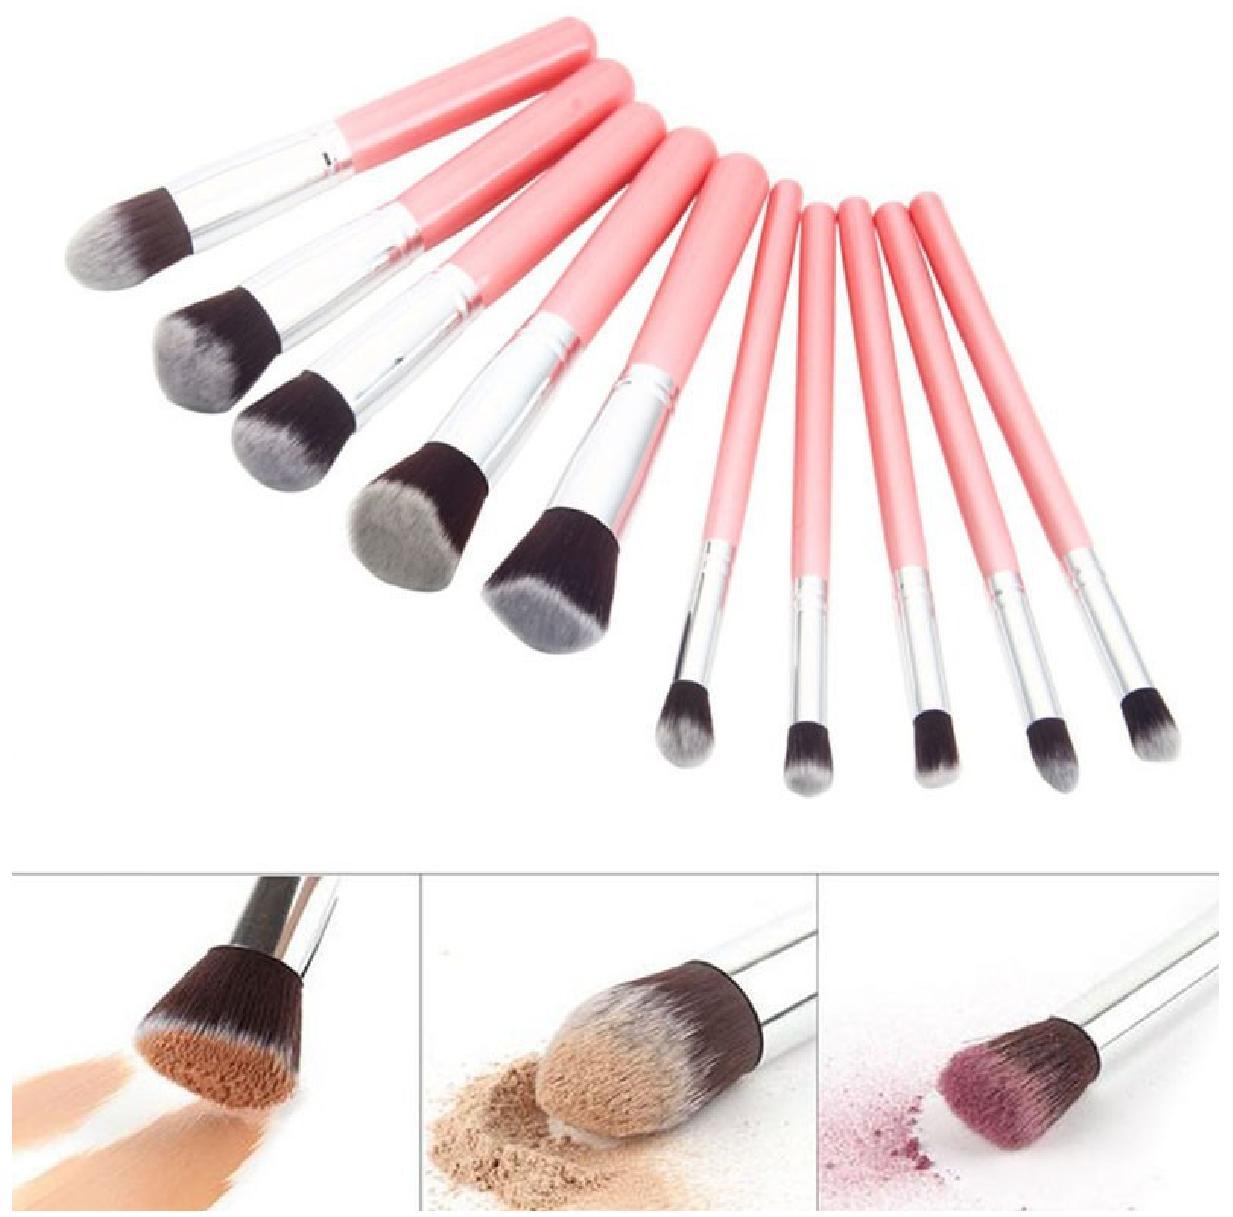 Kelebihan Jbs New York Kuas Makeup Brush 10 Set Make Up Bundle Paket K 070 Egg Spon Telur K009